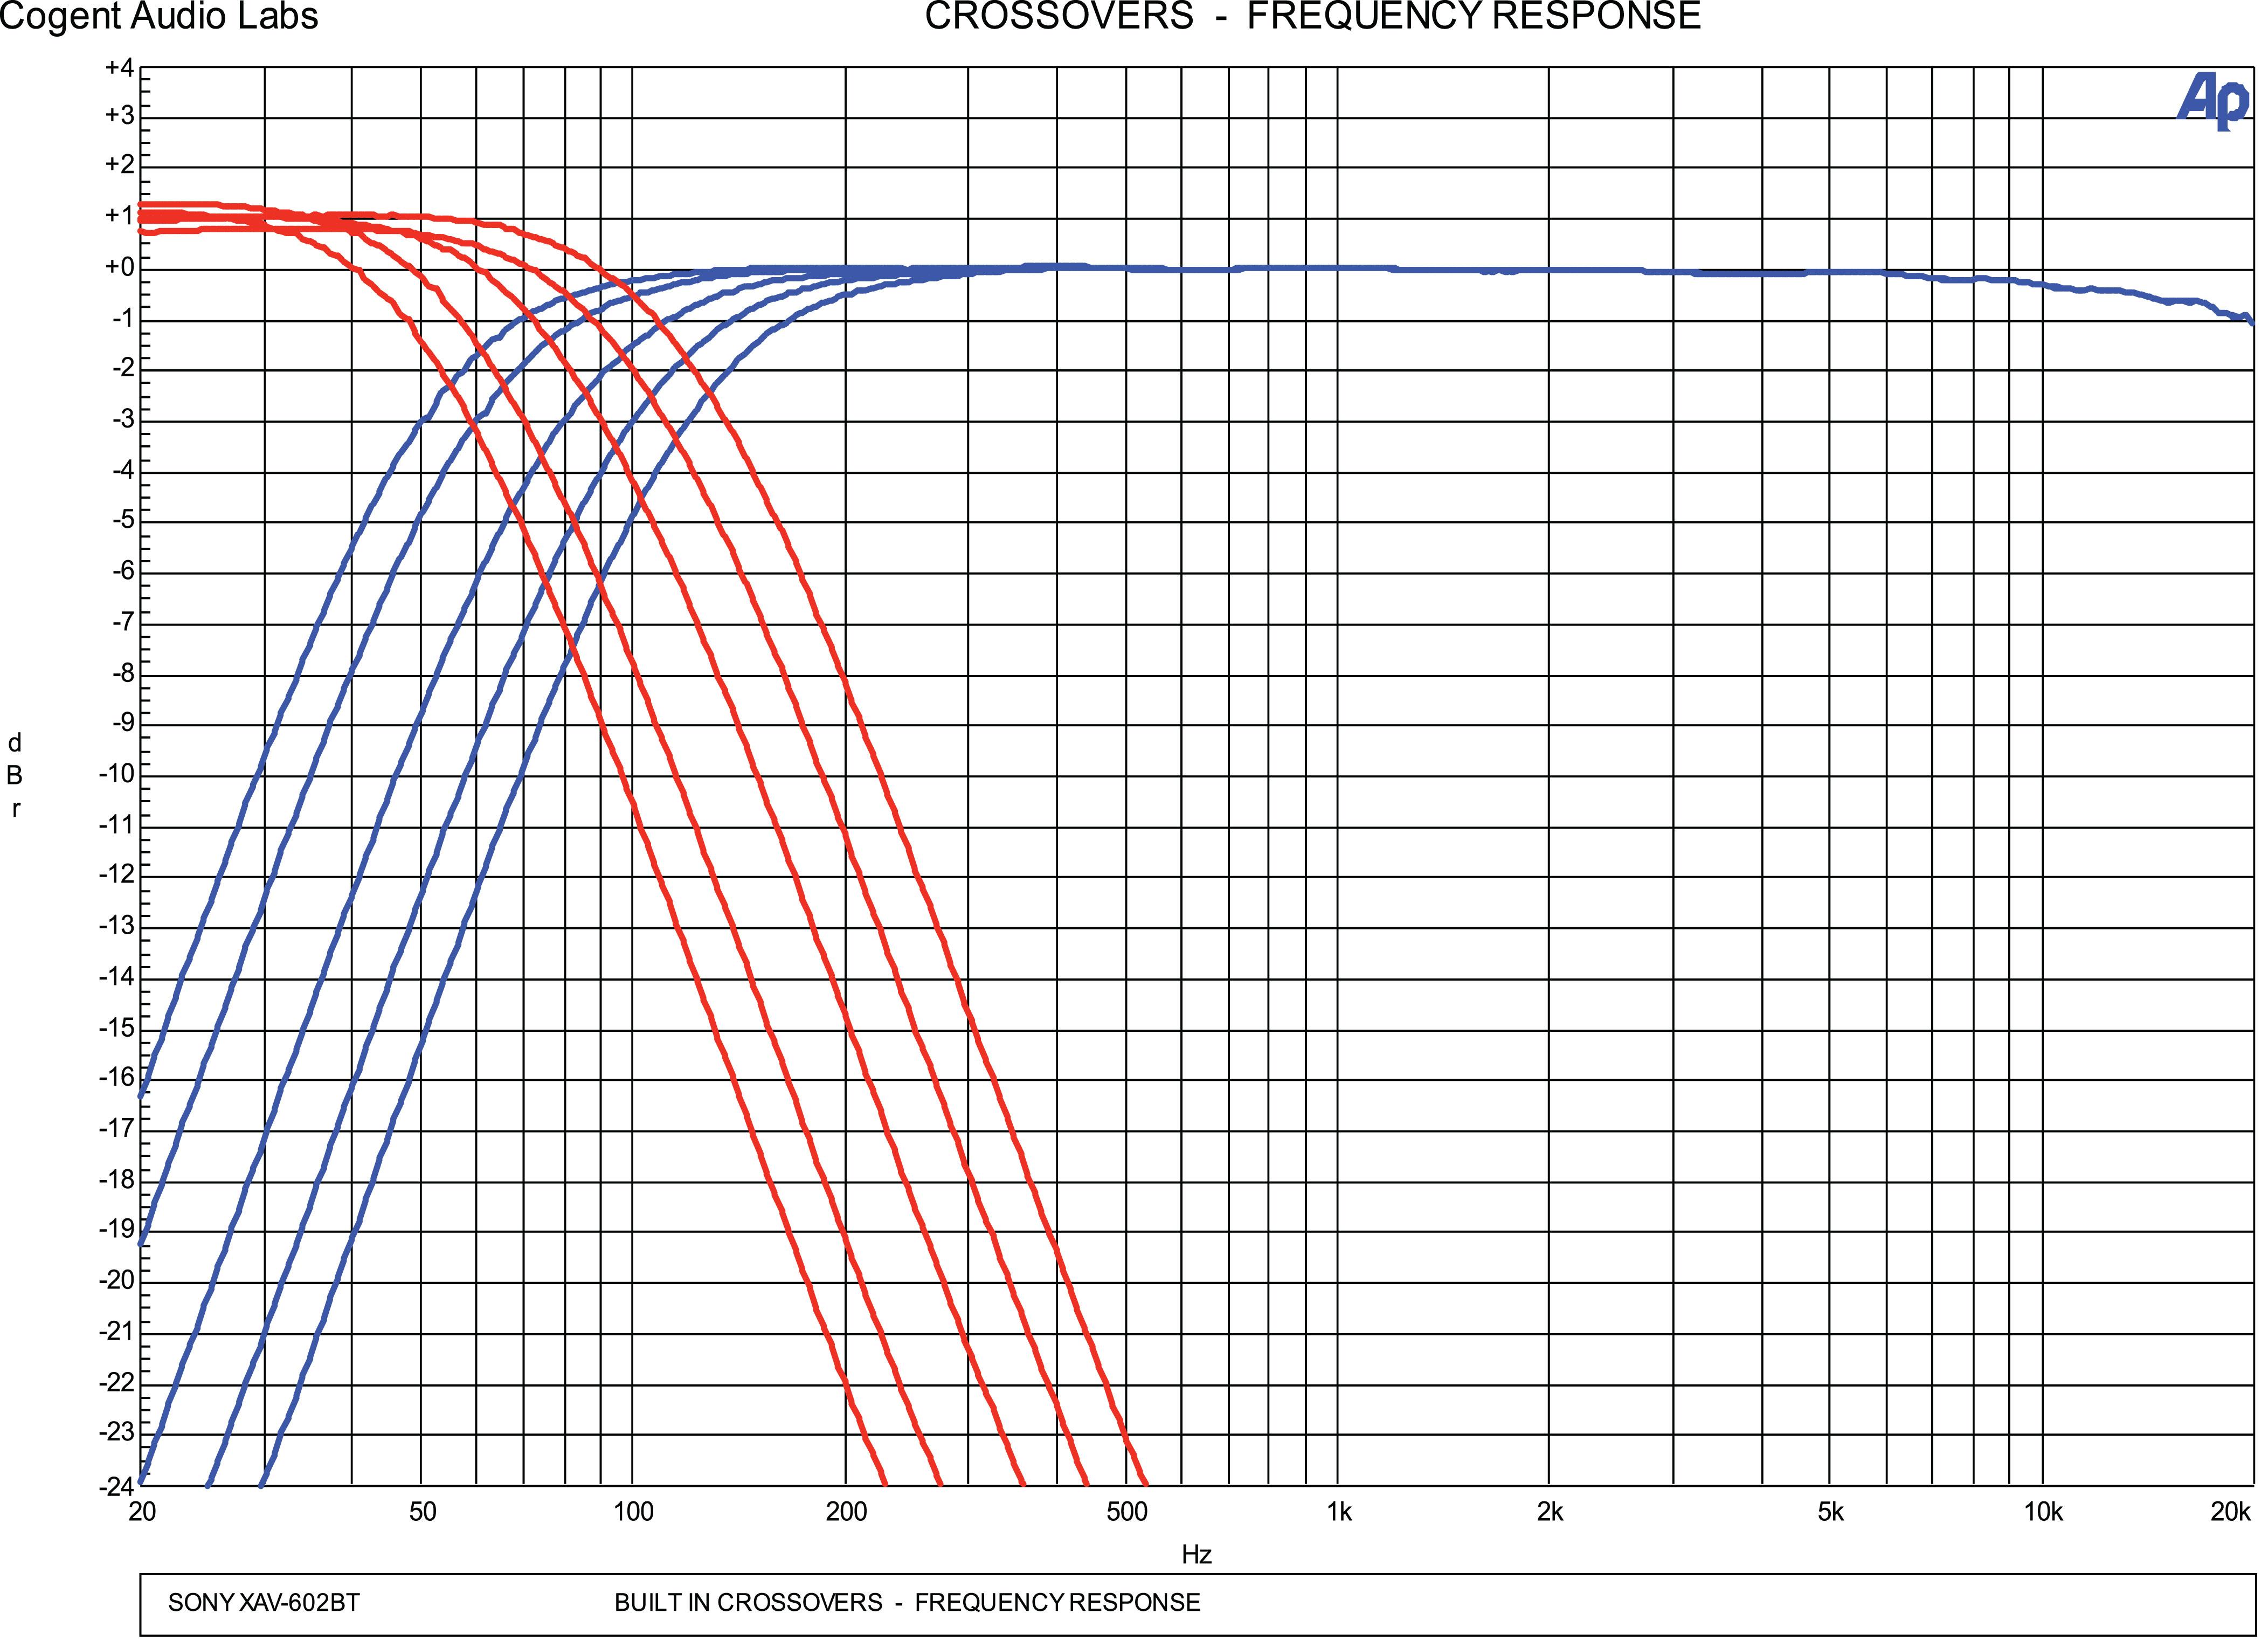 sony xav 601bt wiring diagram wiring library Sony Xav 601bt Wiring Diagram wrg 2562] sony xav 601bt wiring diagram